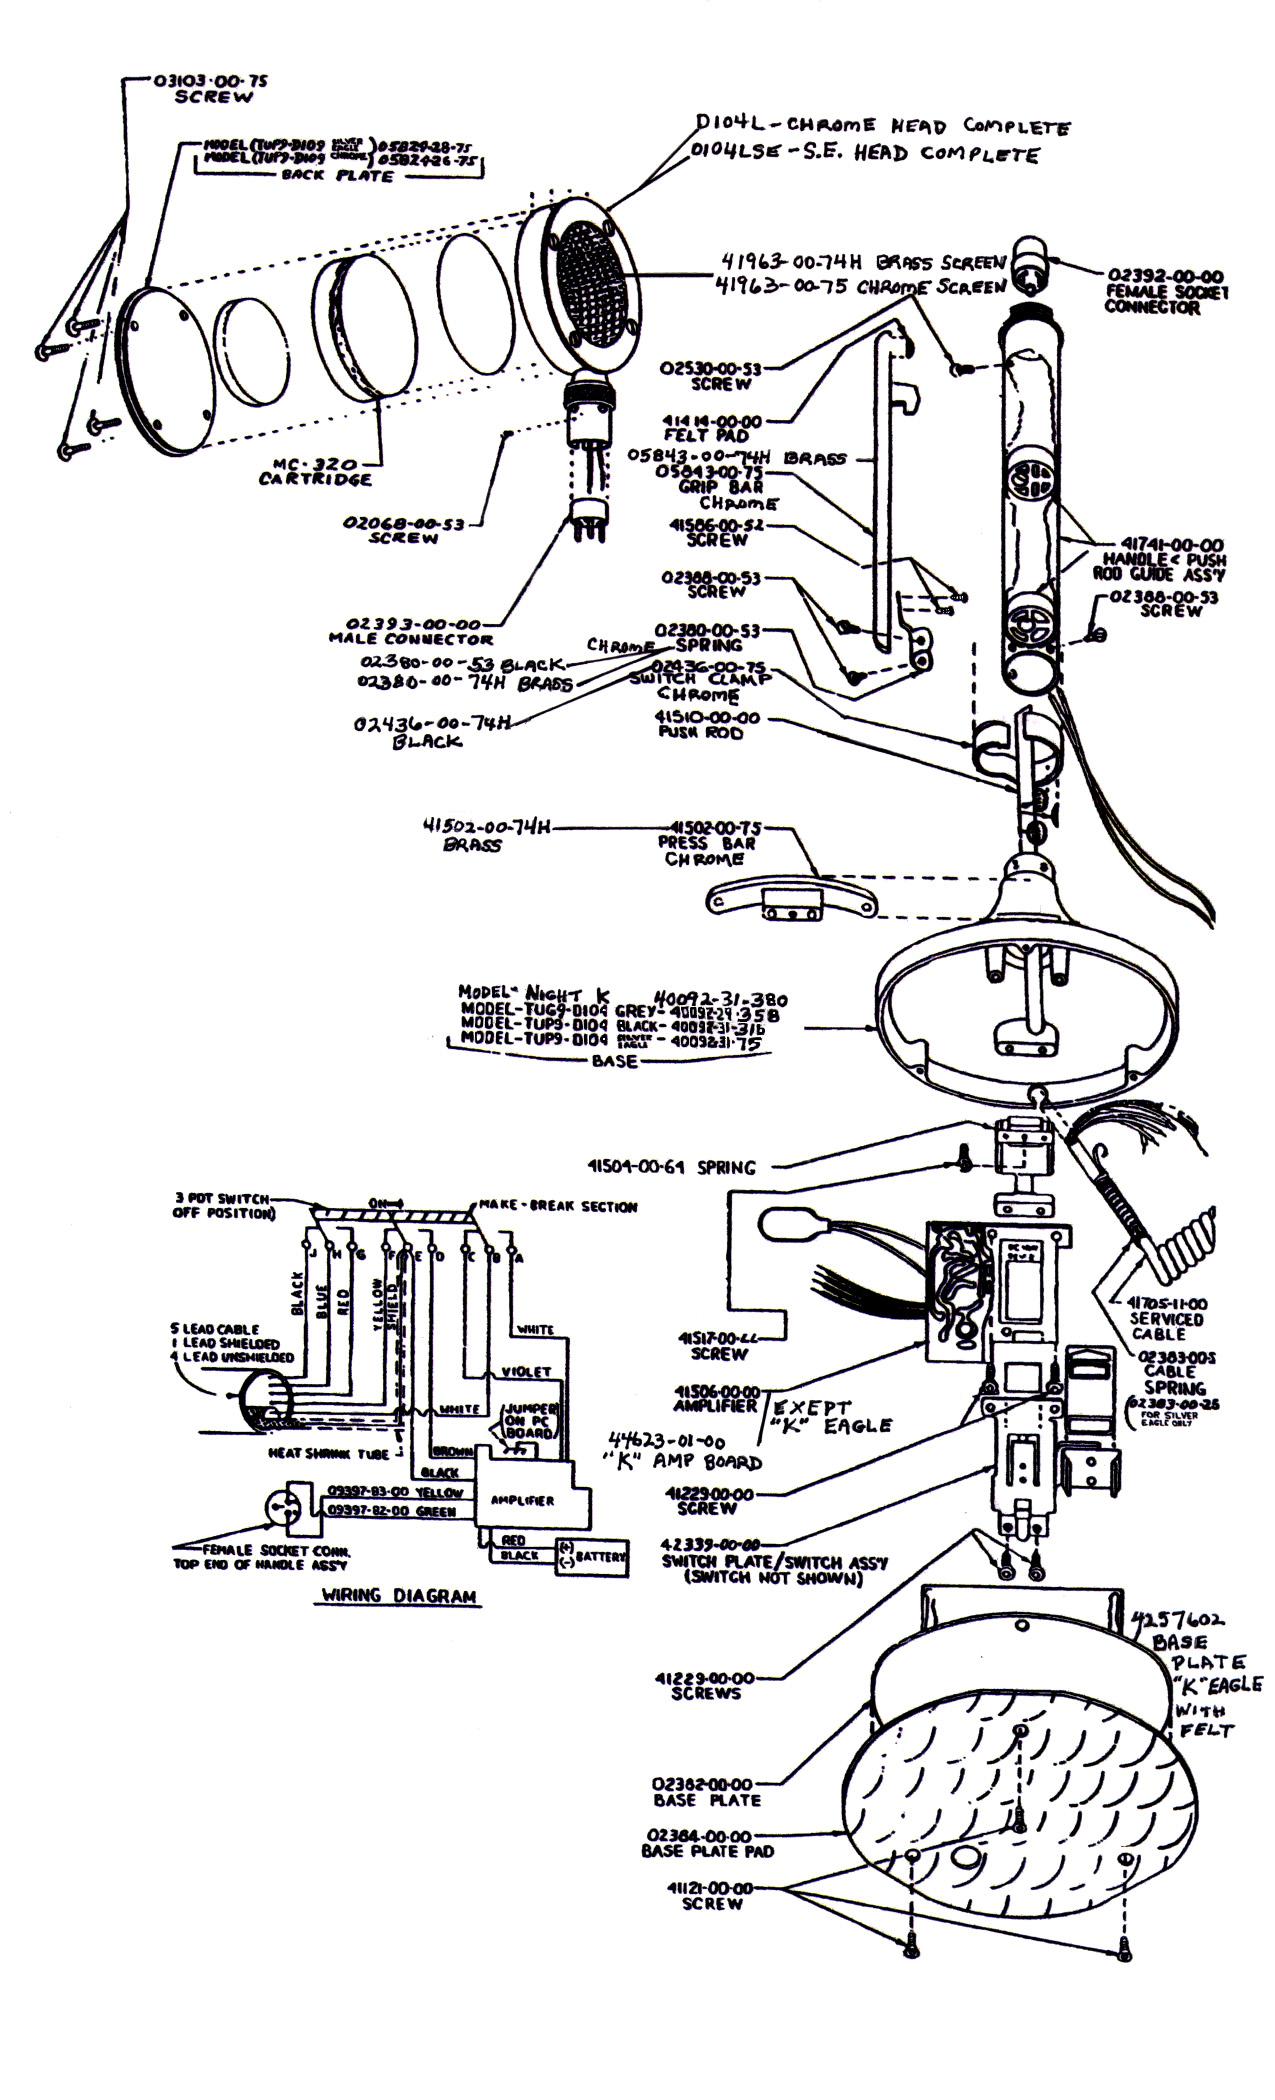 D104 Silver Eagle Wiring Diagram